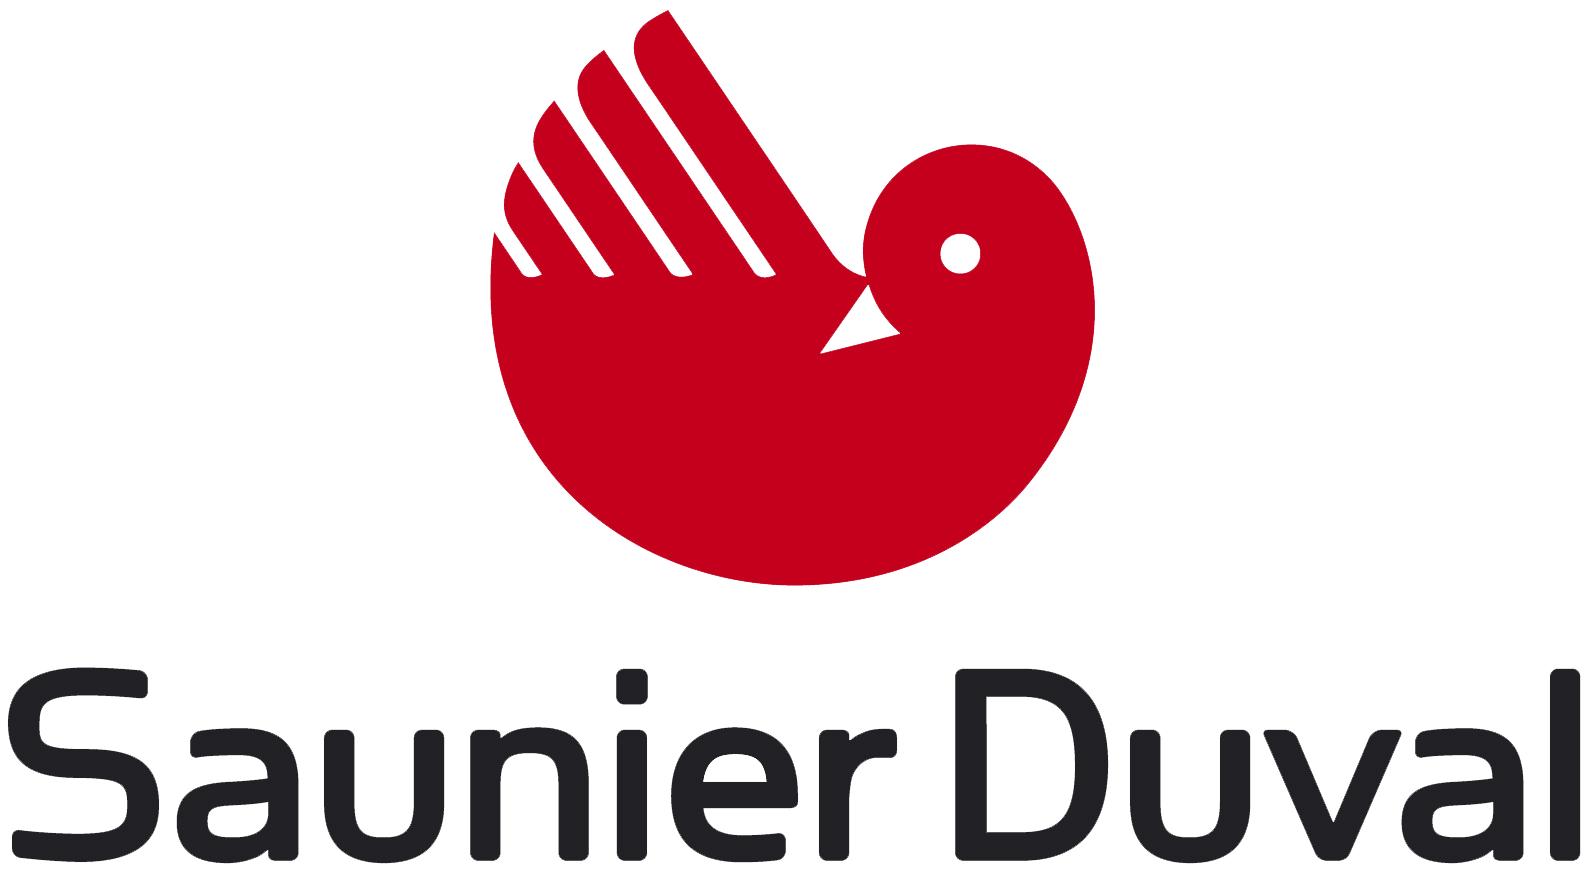 Saunier Duval logo leading brand for heating technology